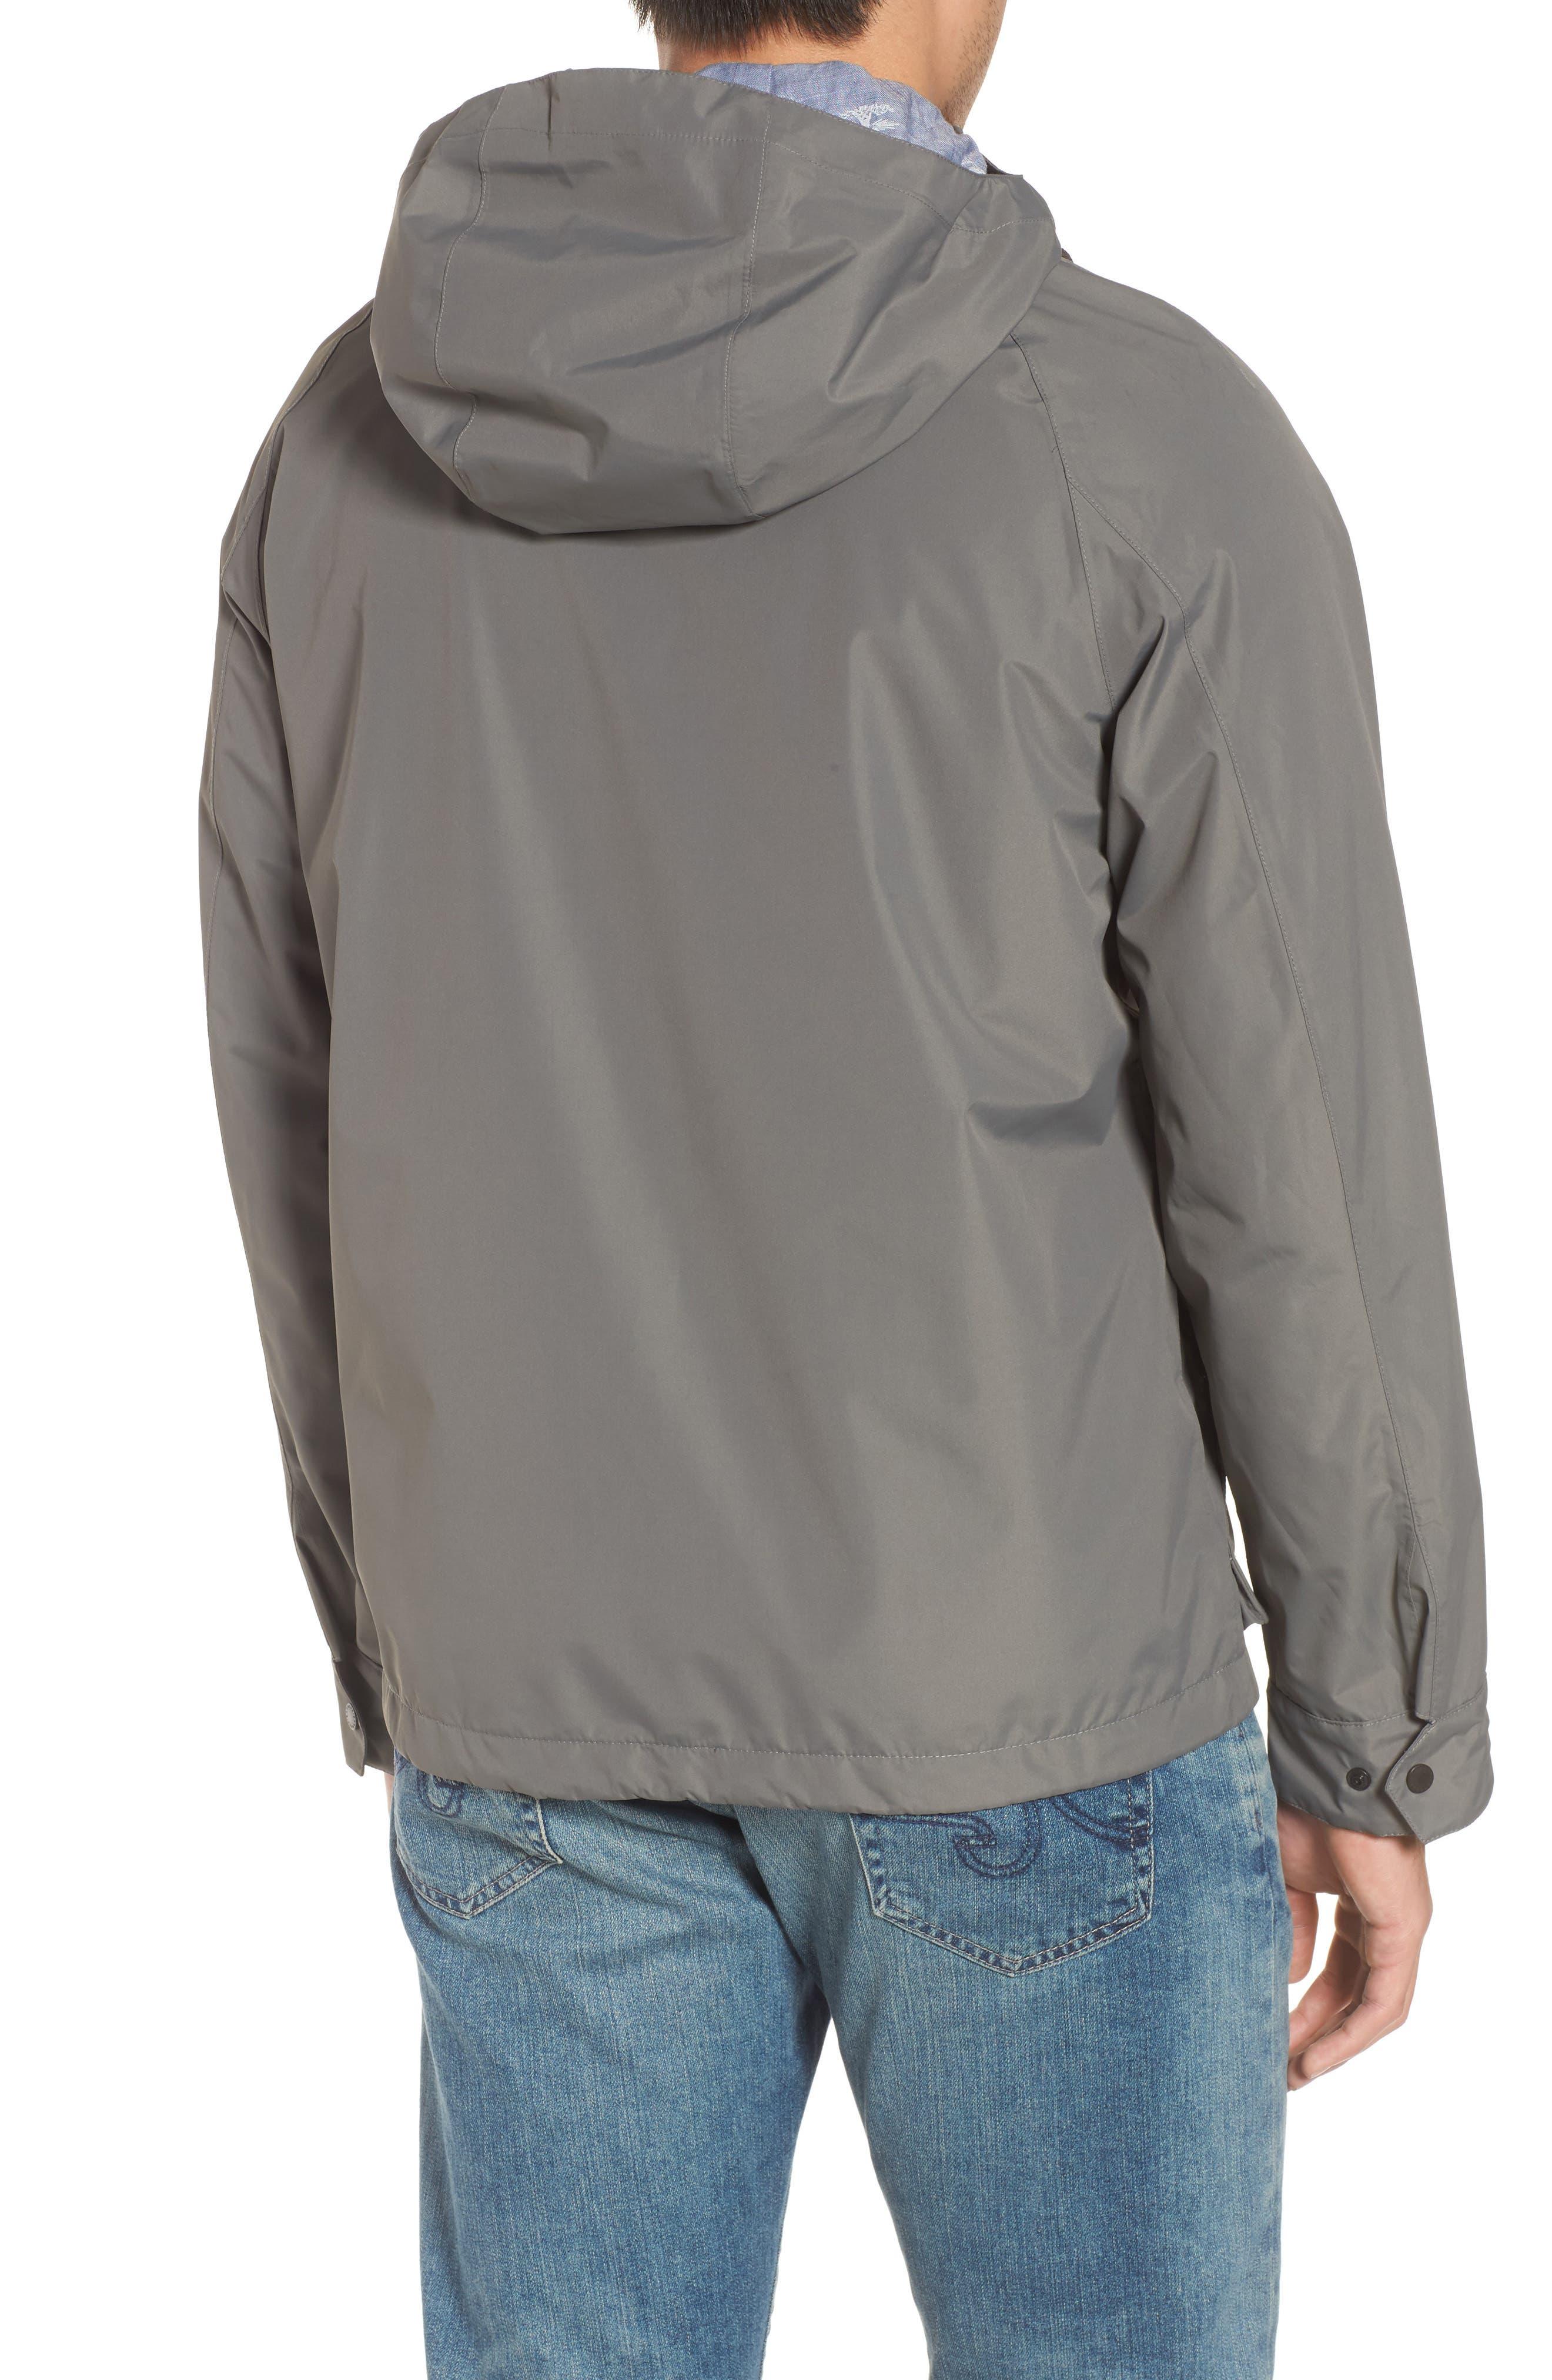 Twine Jacket,                             Alternate thumbnail 2, color,                             Grey